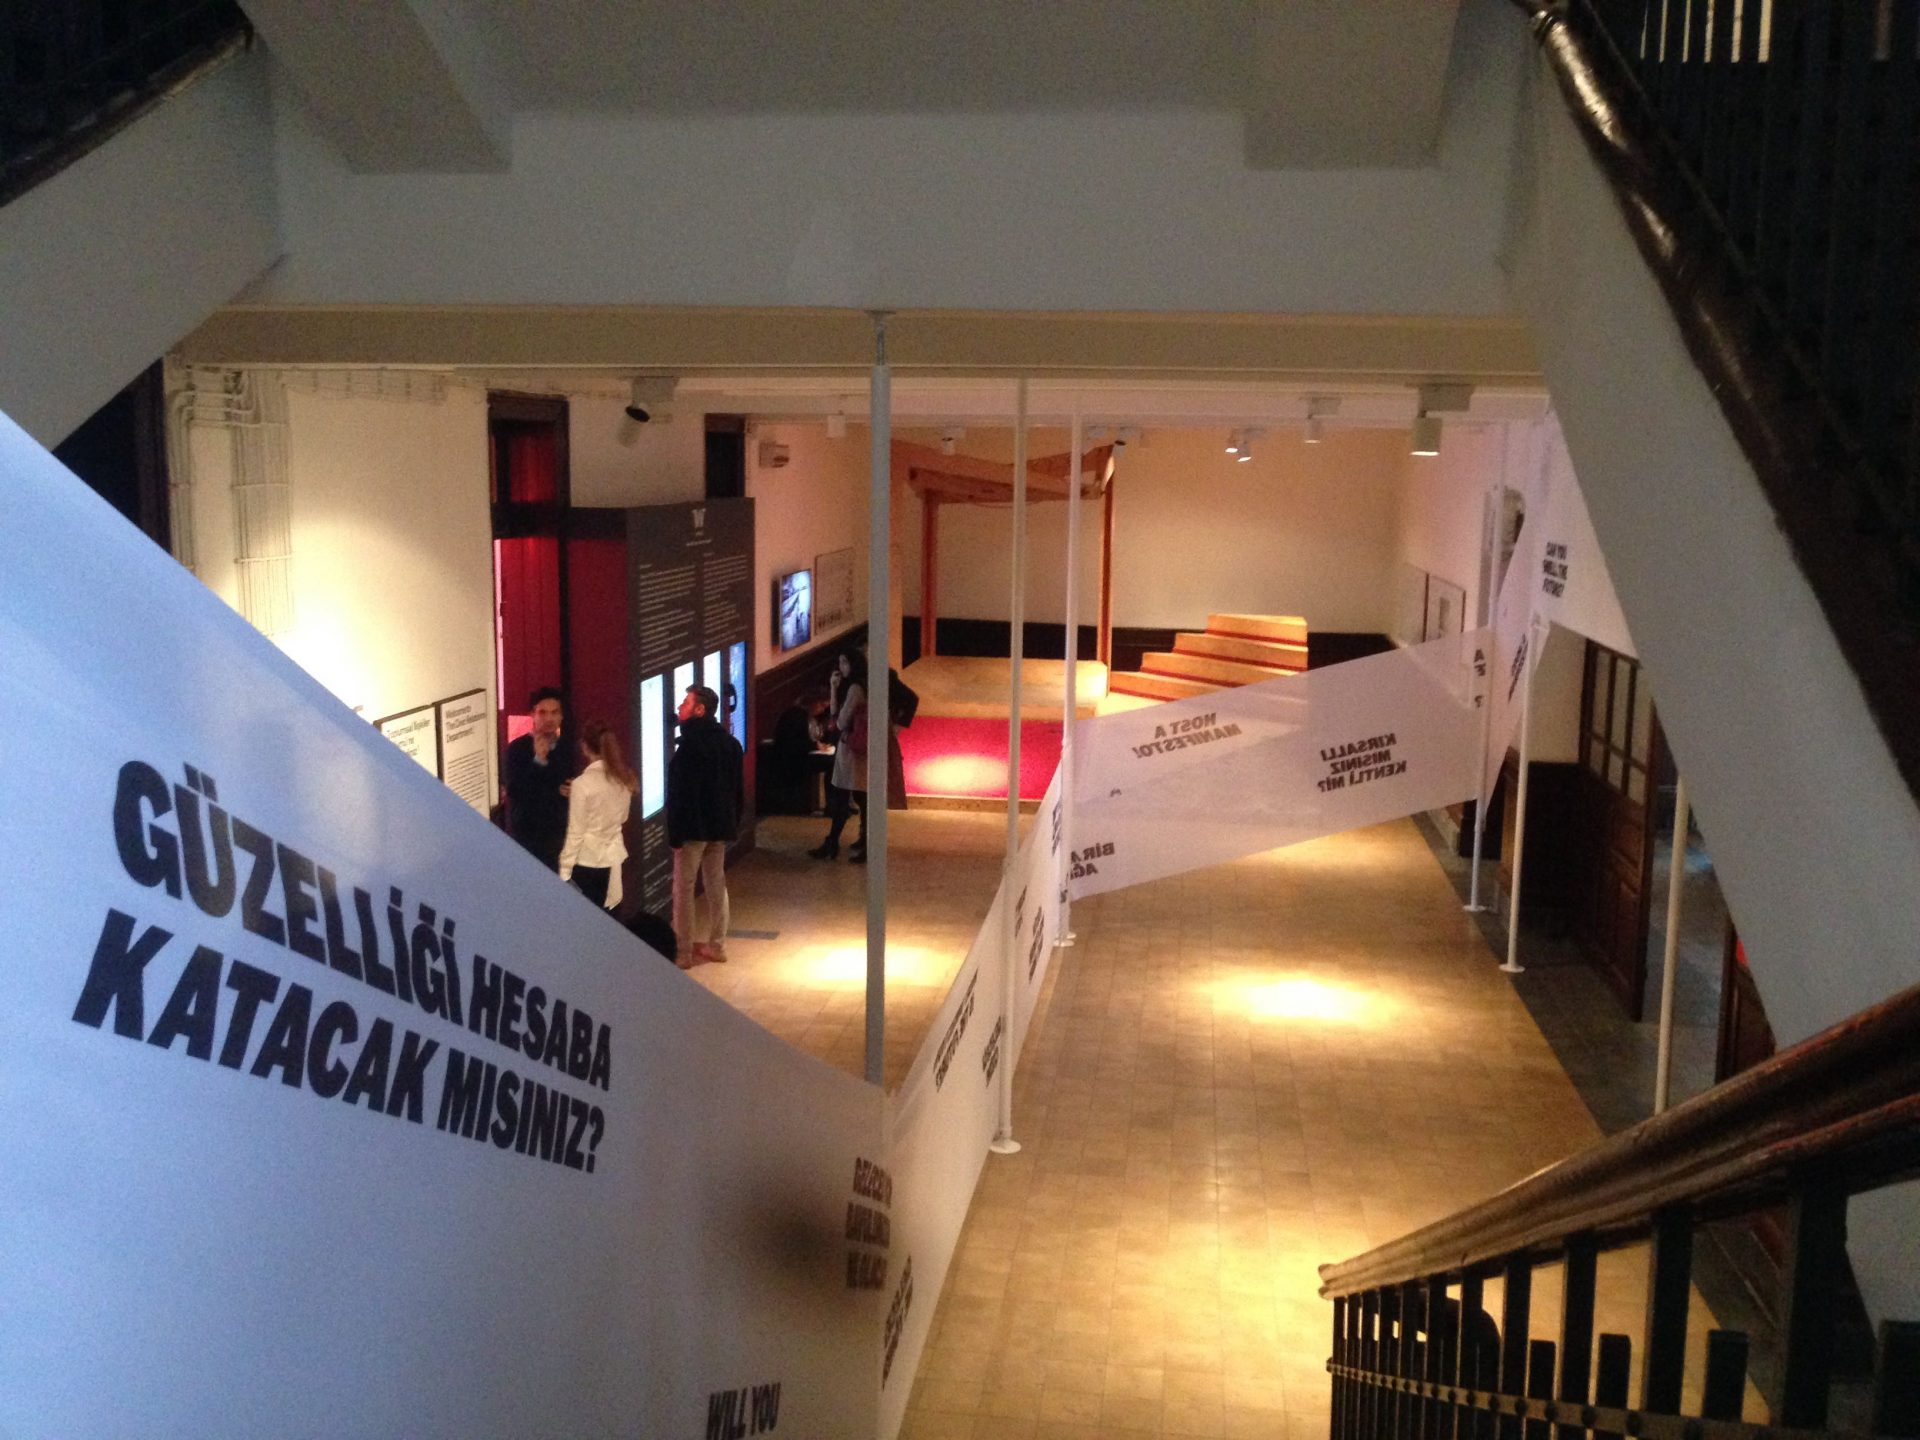 Istanbul Biennal 2014